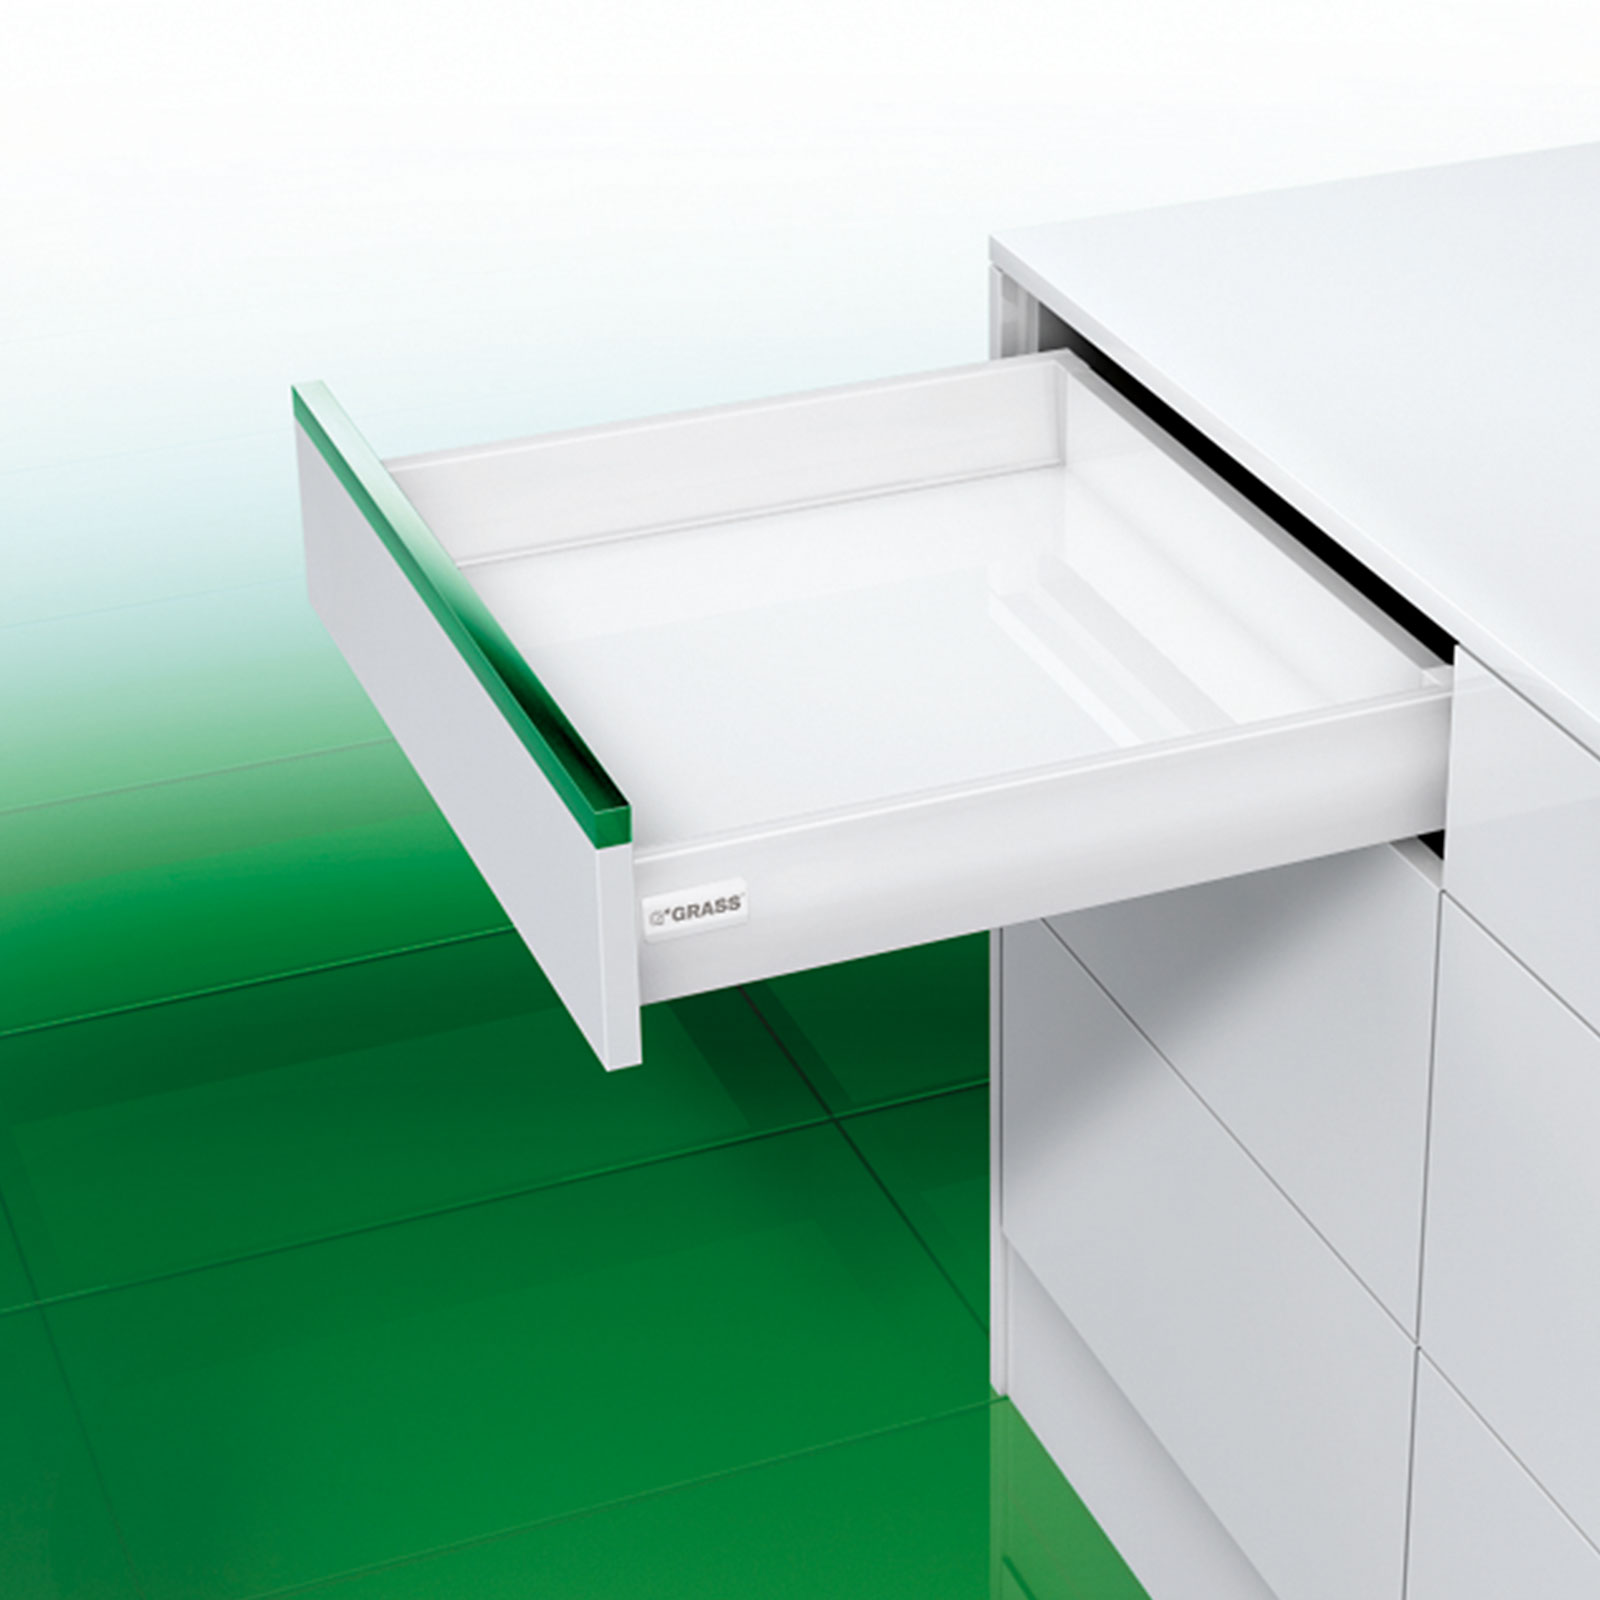 GRASS DWD-XP Schubladensystem 40 kg weiss mit SoftClose ...